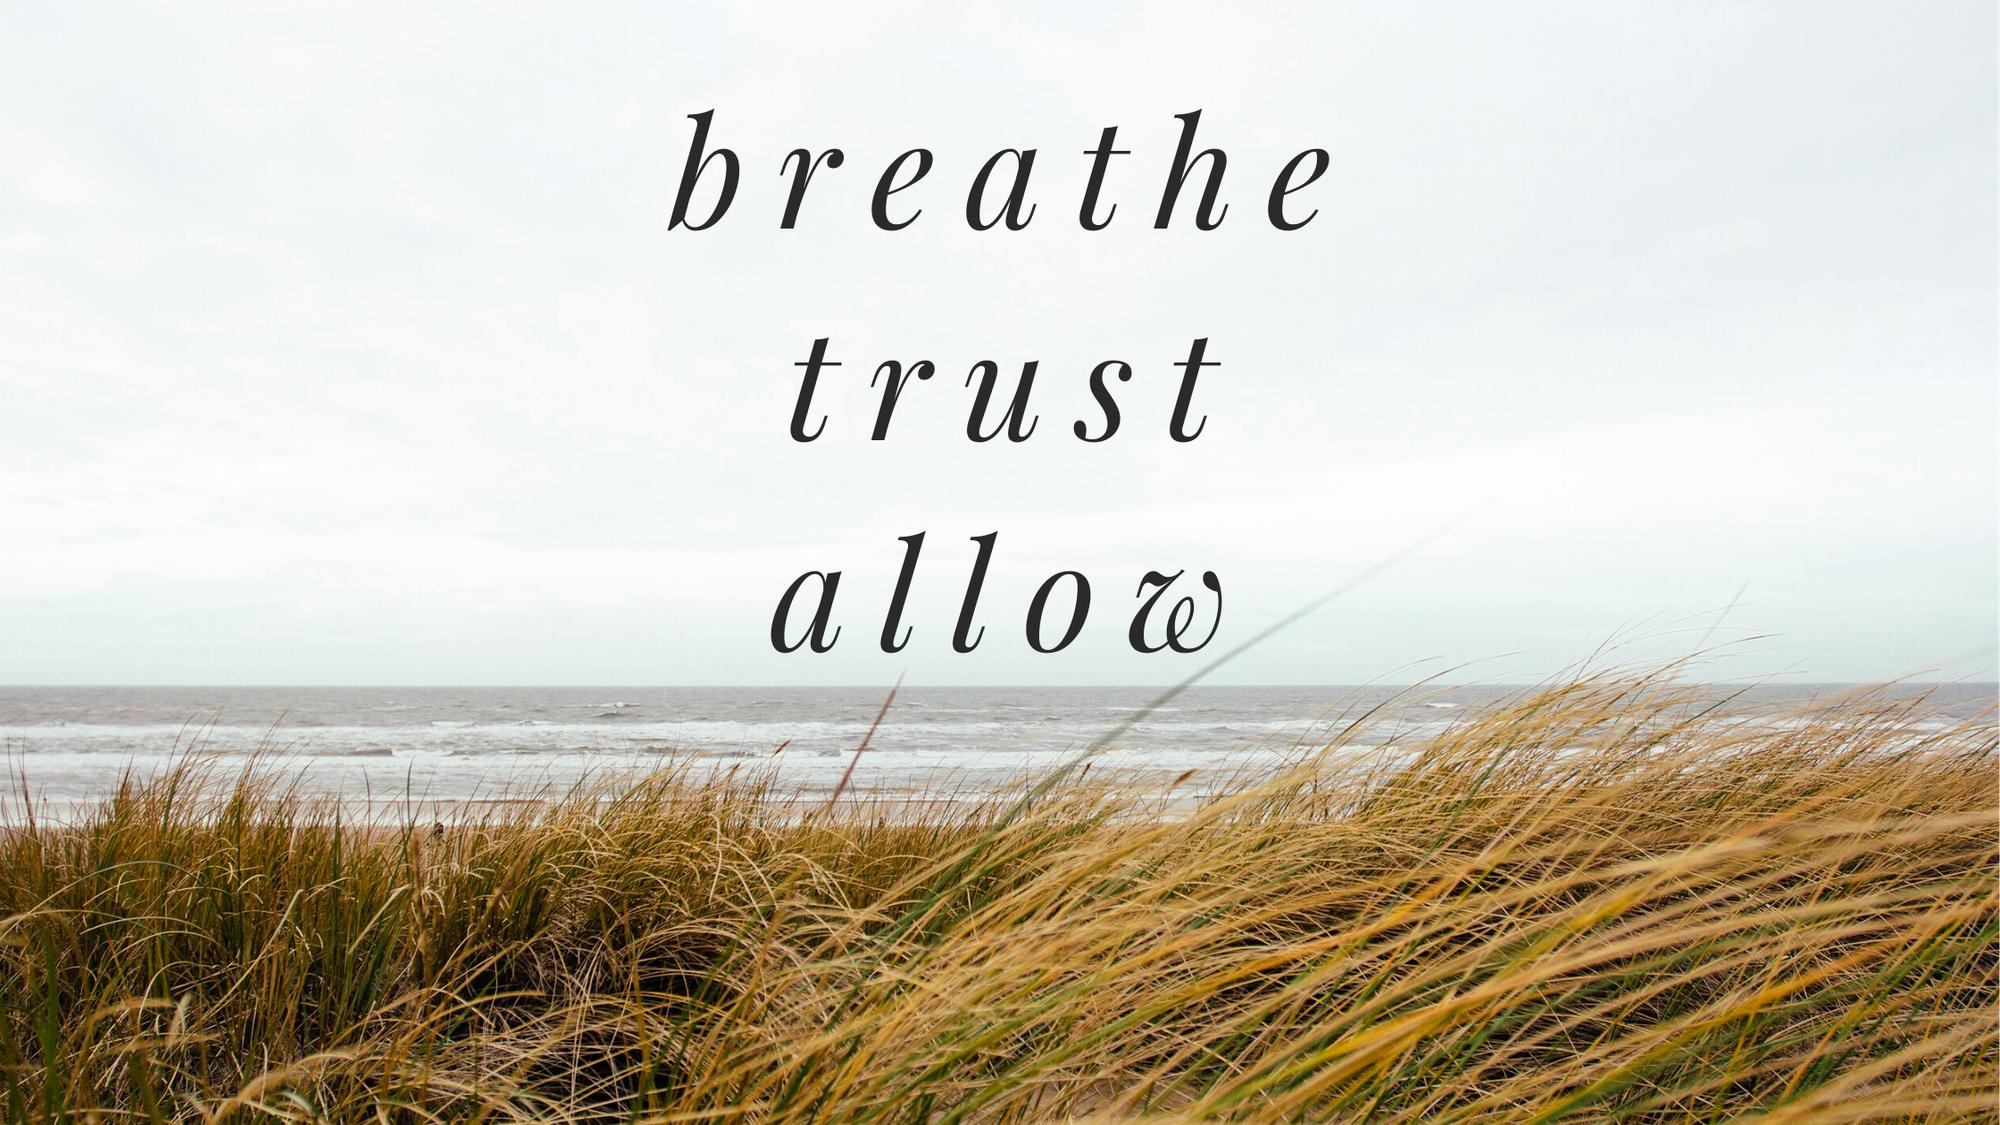 Breathe, Trust, Allow